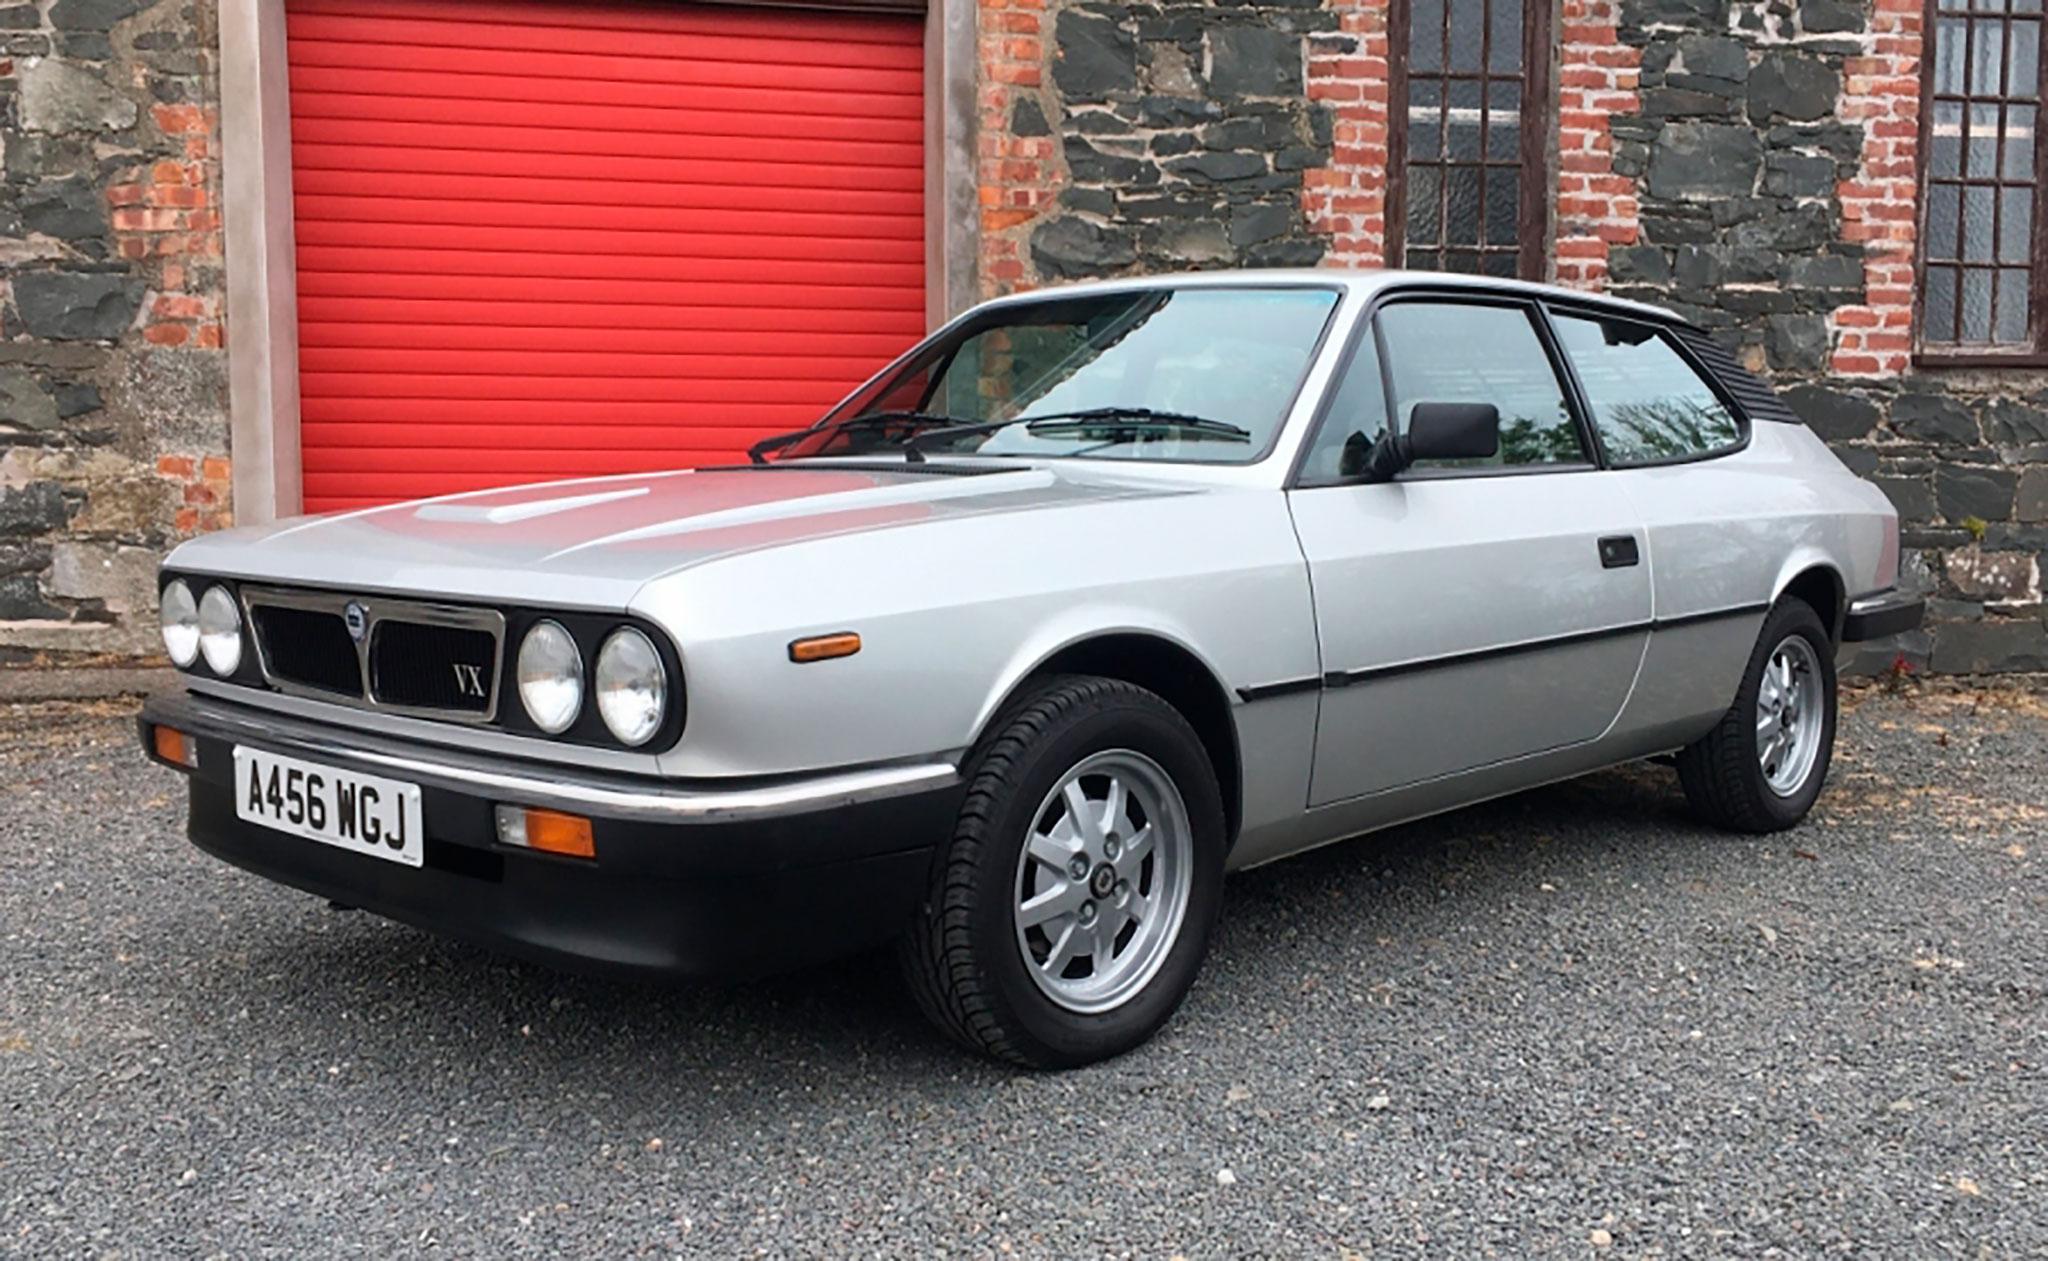 1984 Lancia Beta HPE Volumex - CCA au London Classic Car Show 2021.